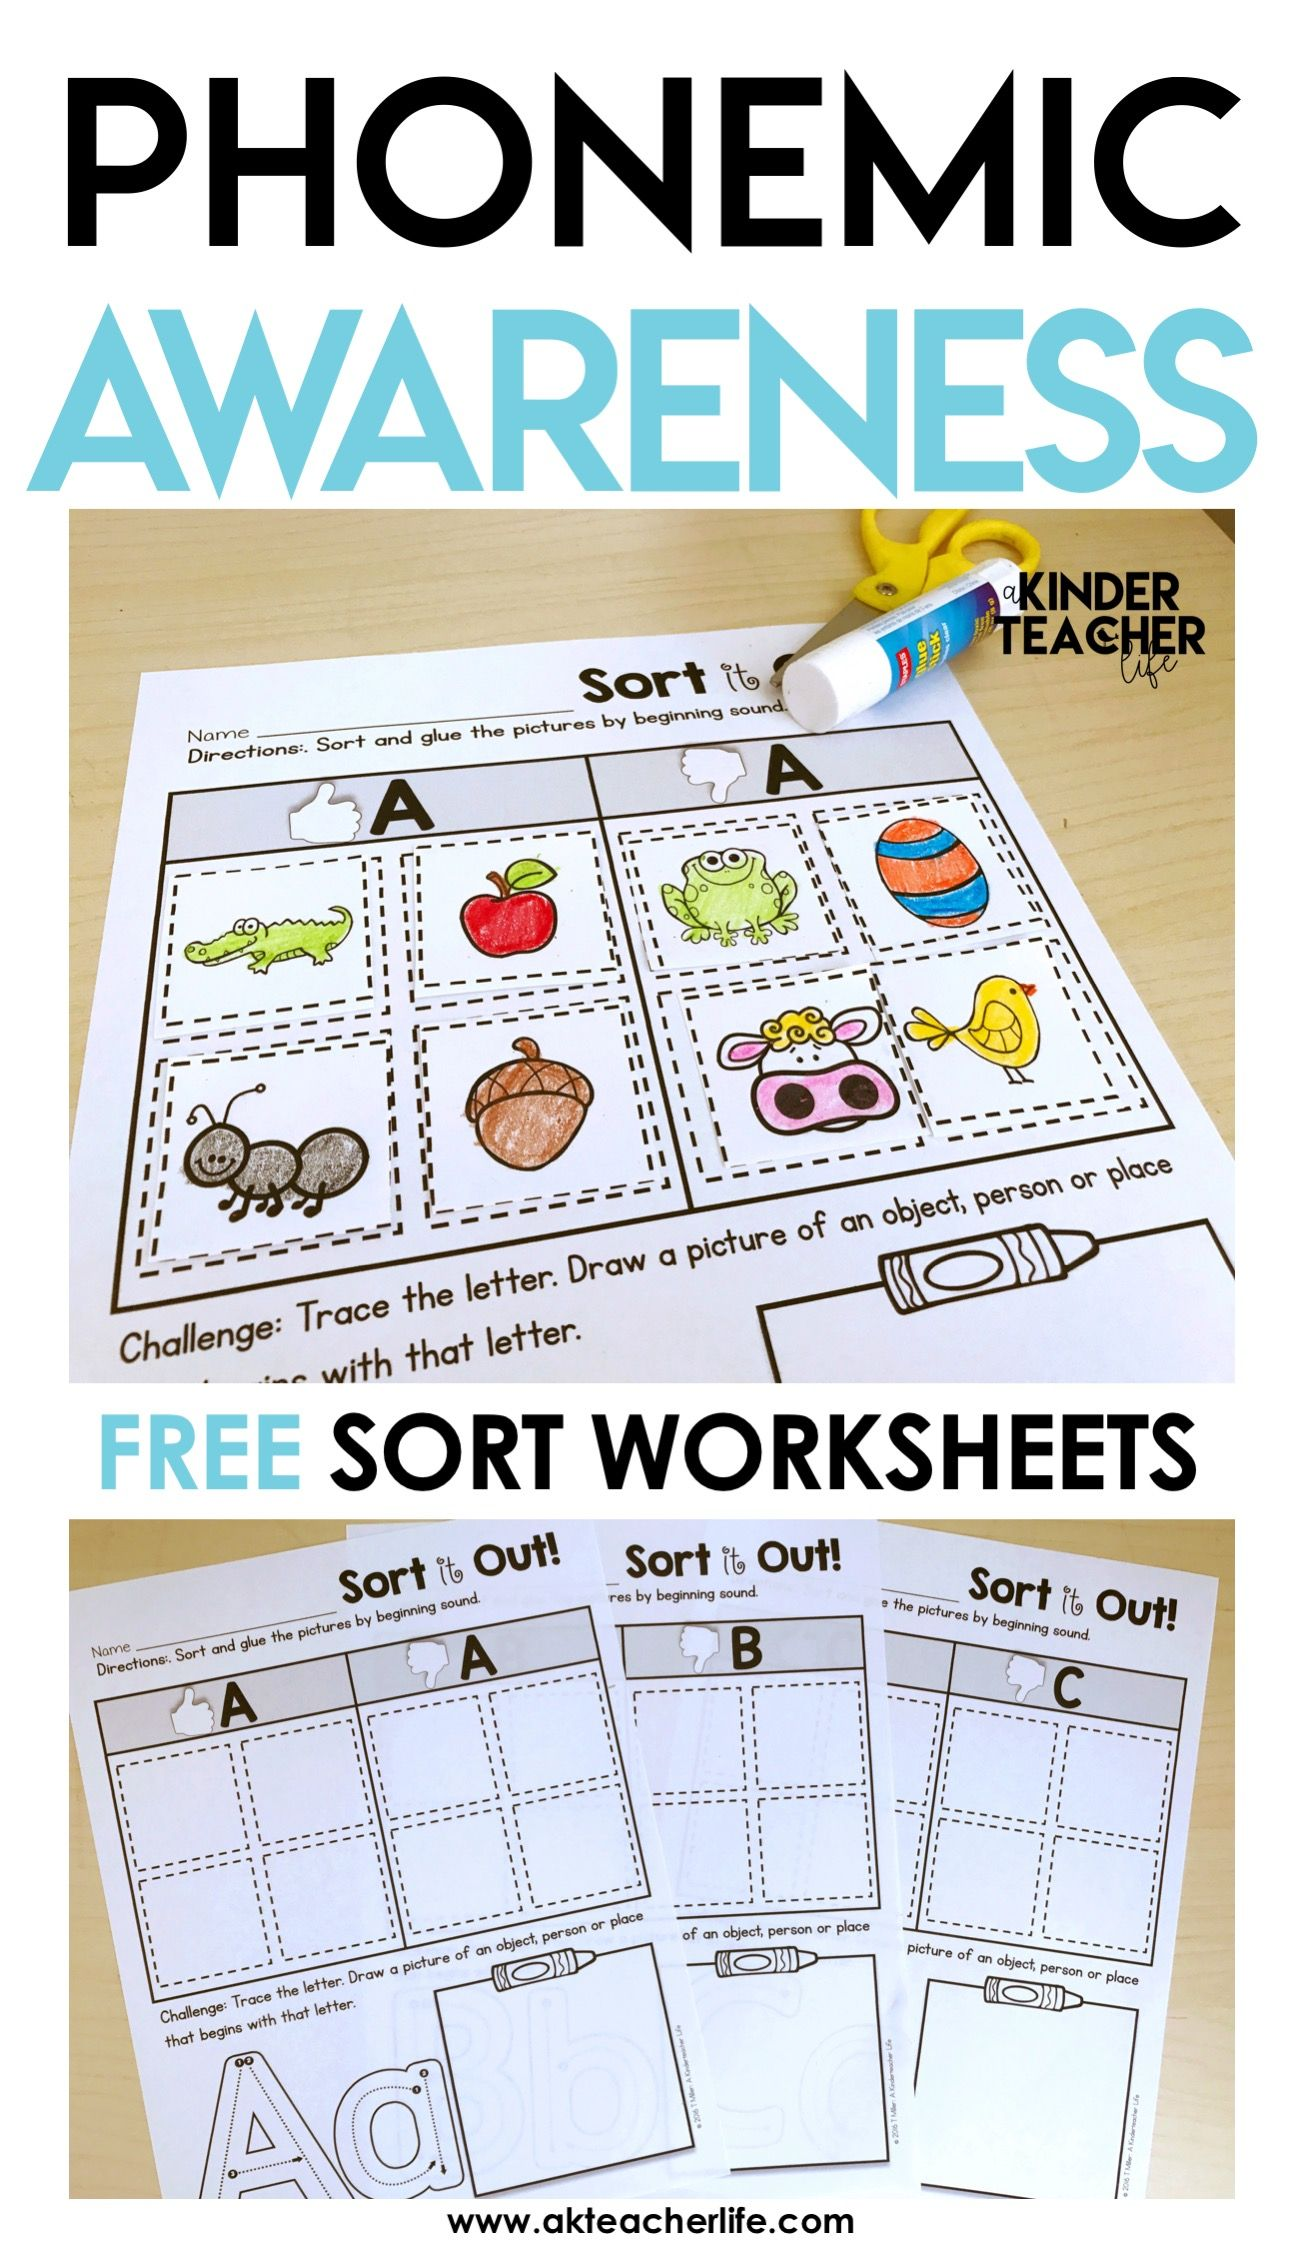 hight resolution of FREE Phonemic Awareness Sorting Worksheets   Phonics kindergarten